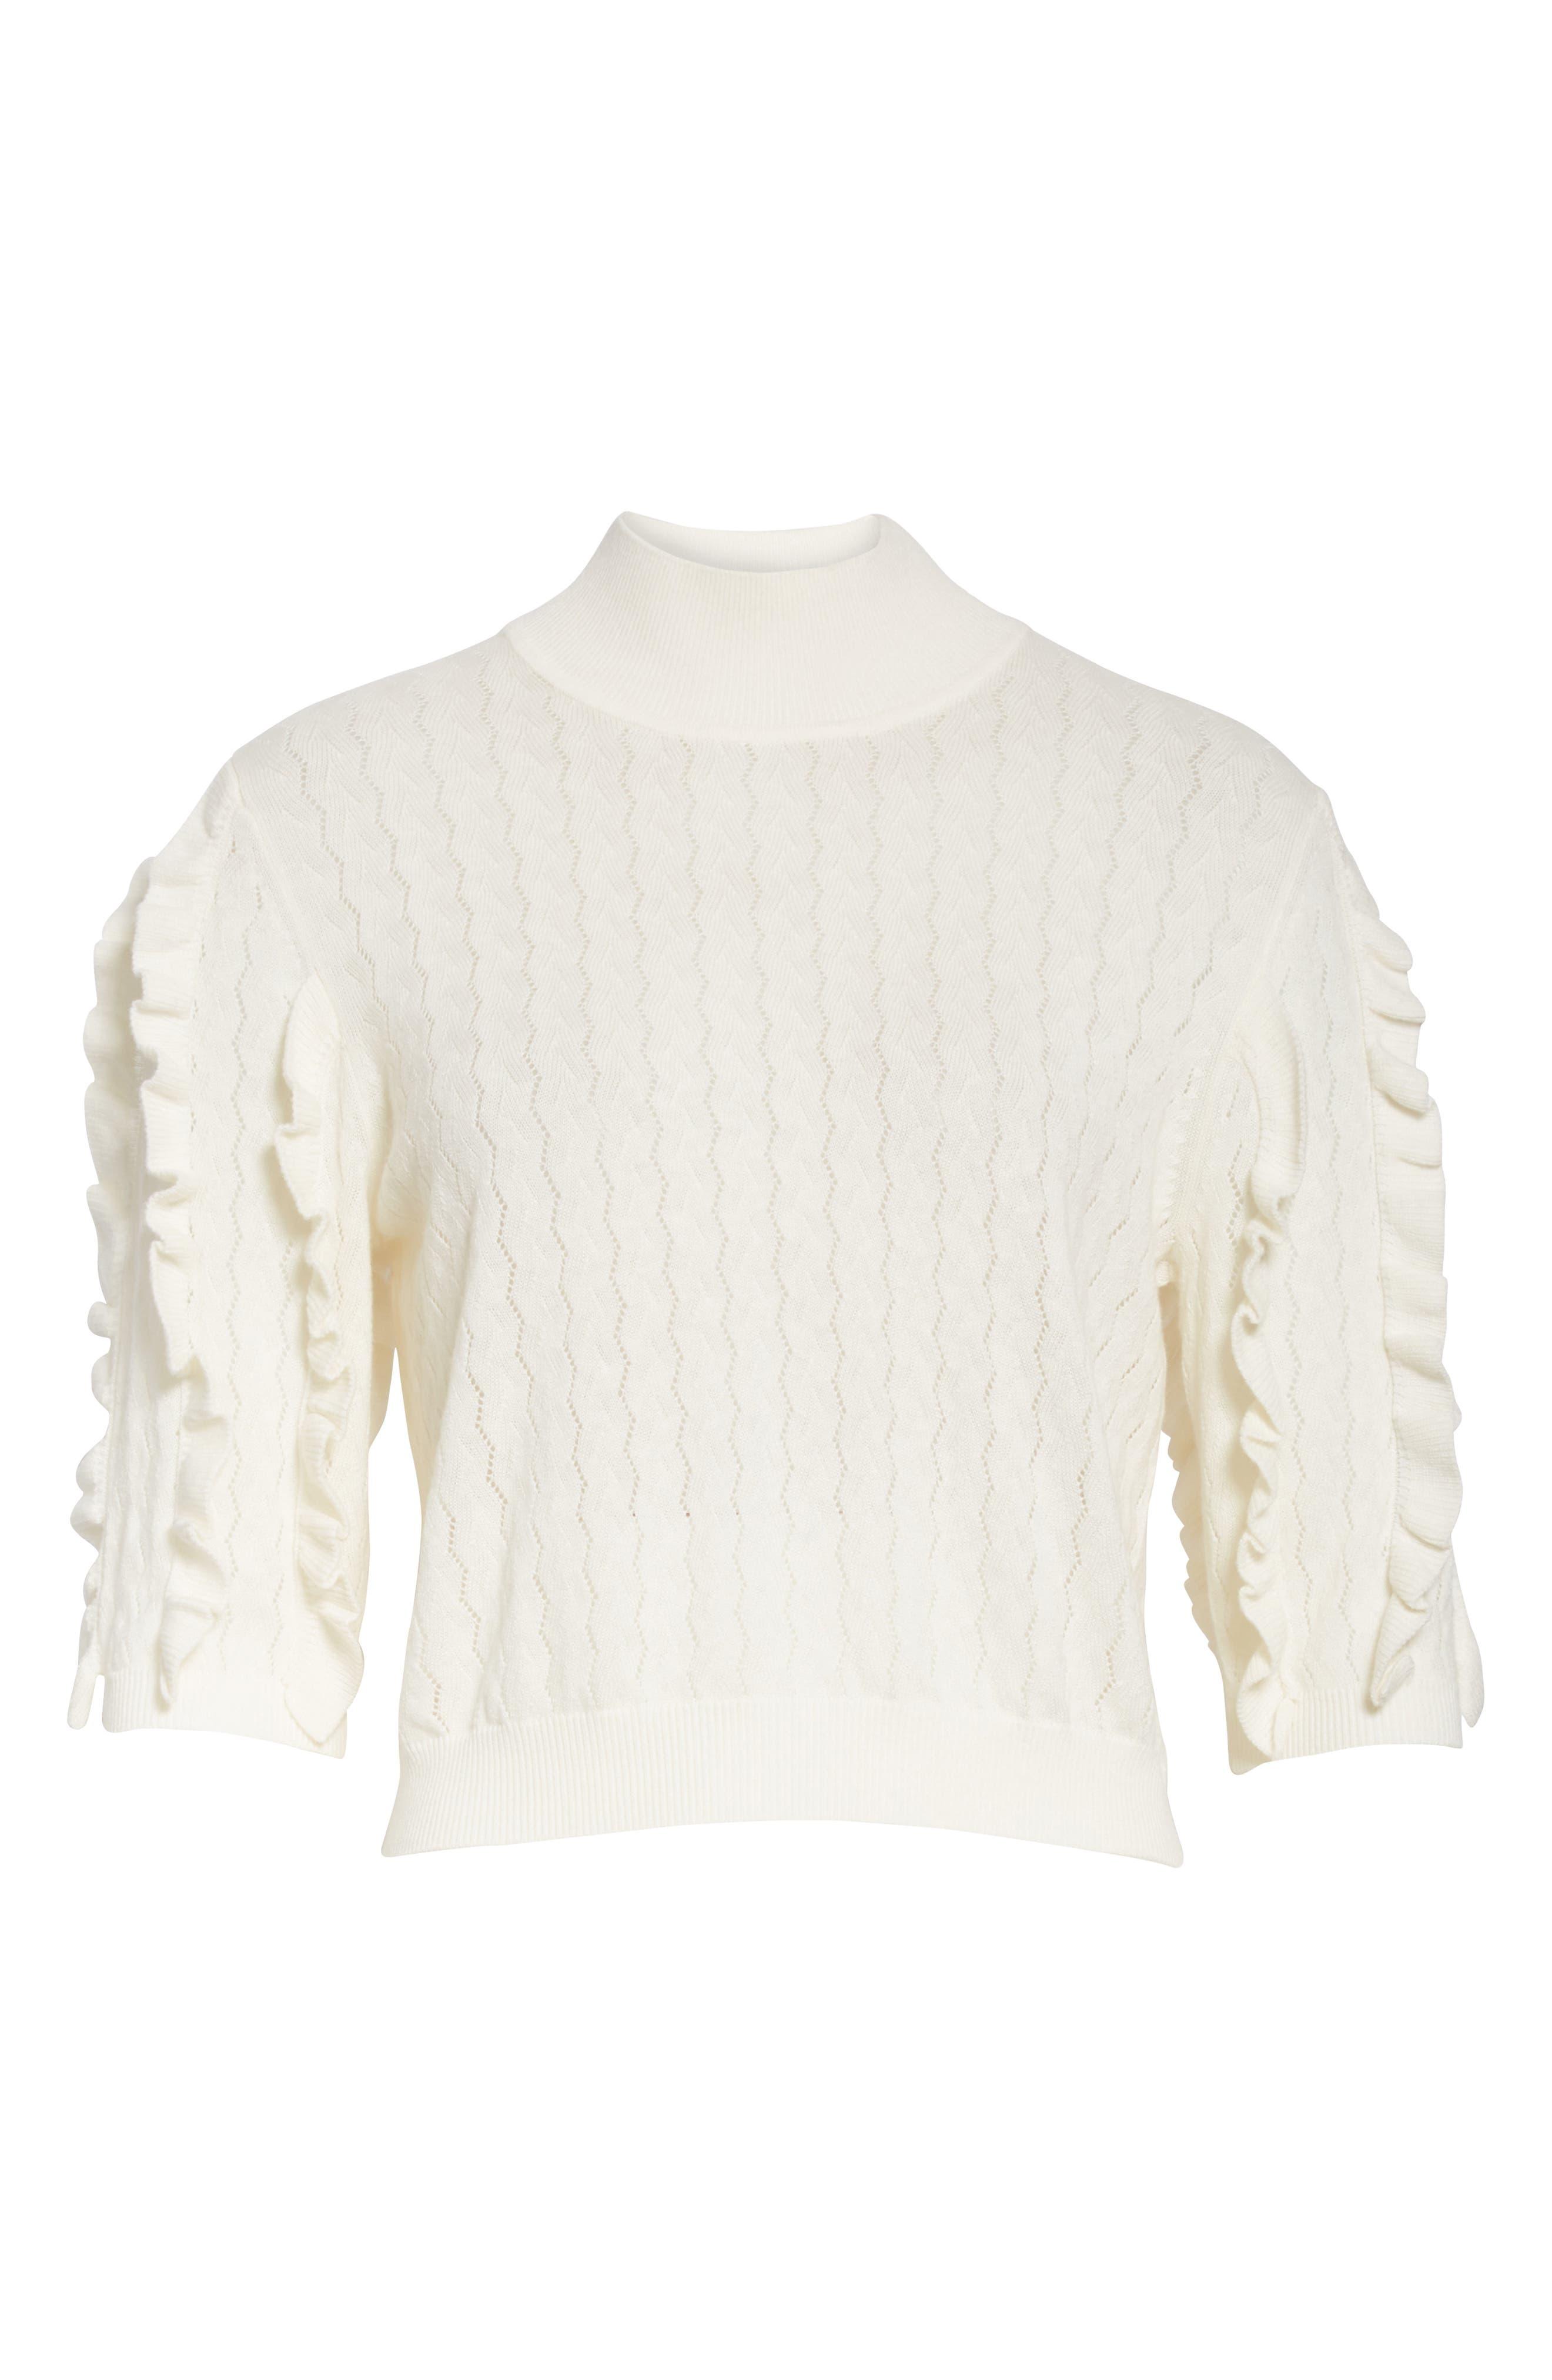 Joie Sweaters Halton Wool & Cashmere Blend Sweater